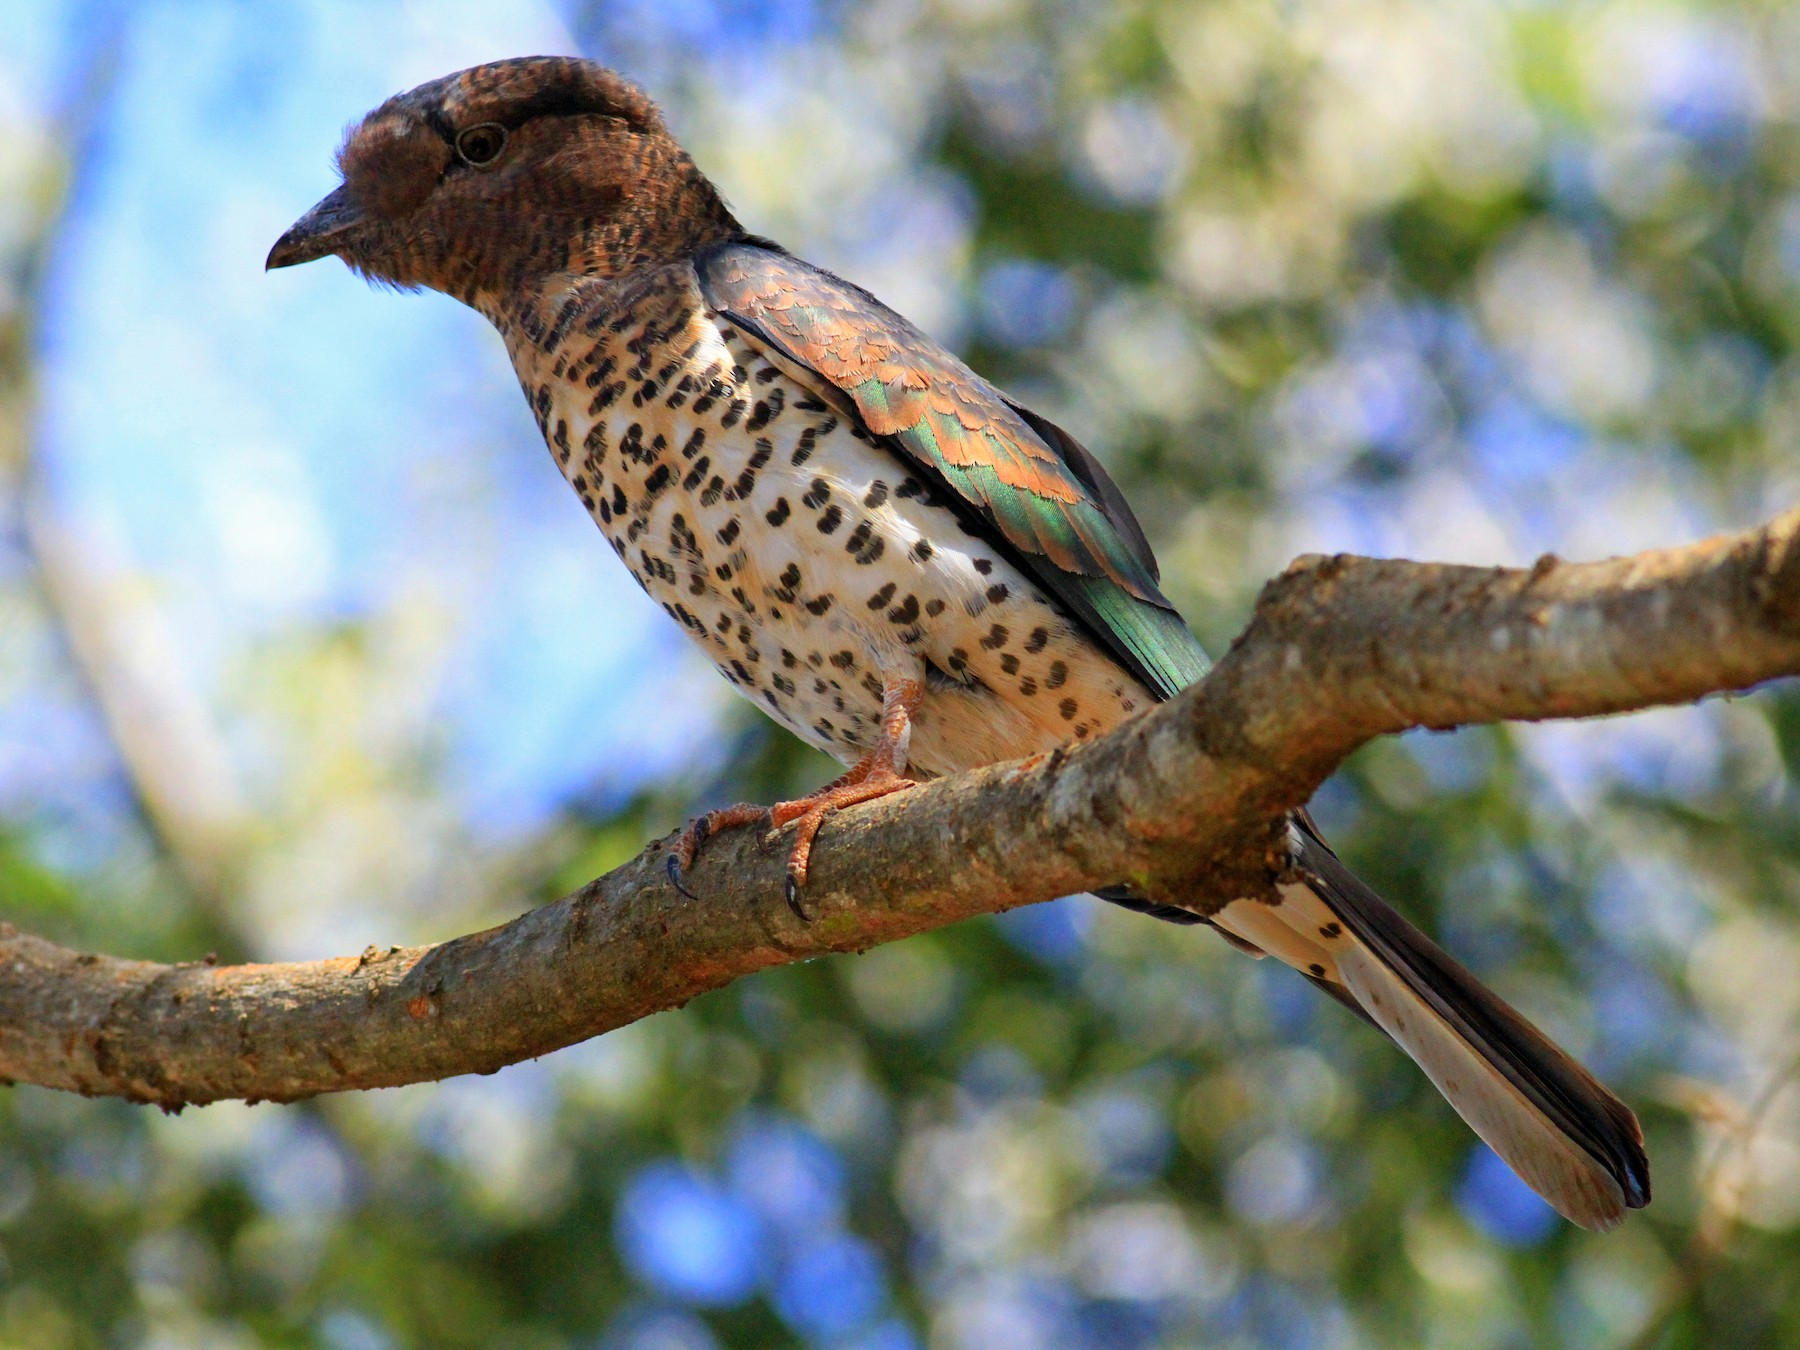 Cuckoo-roller - Darwin Mayhew